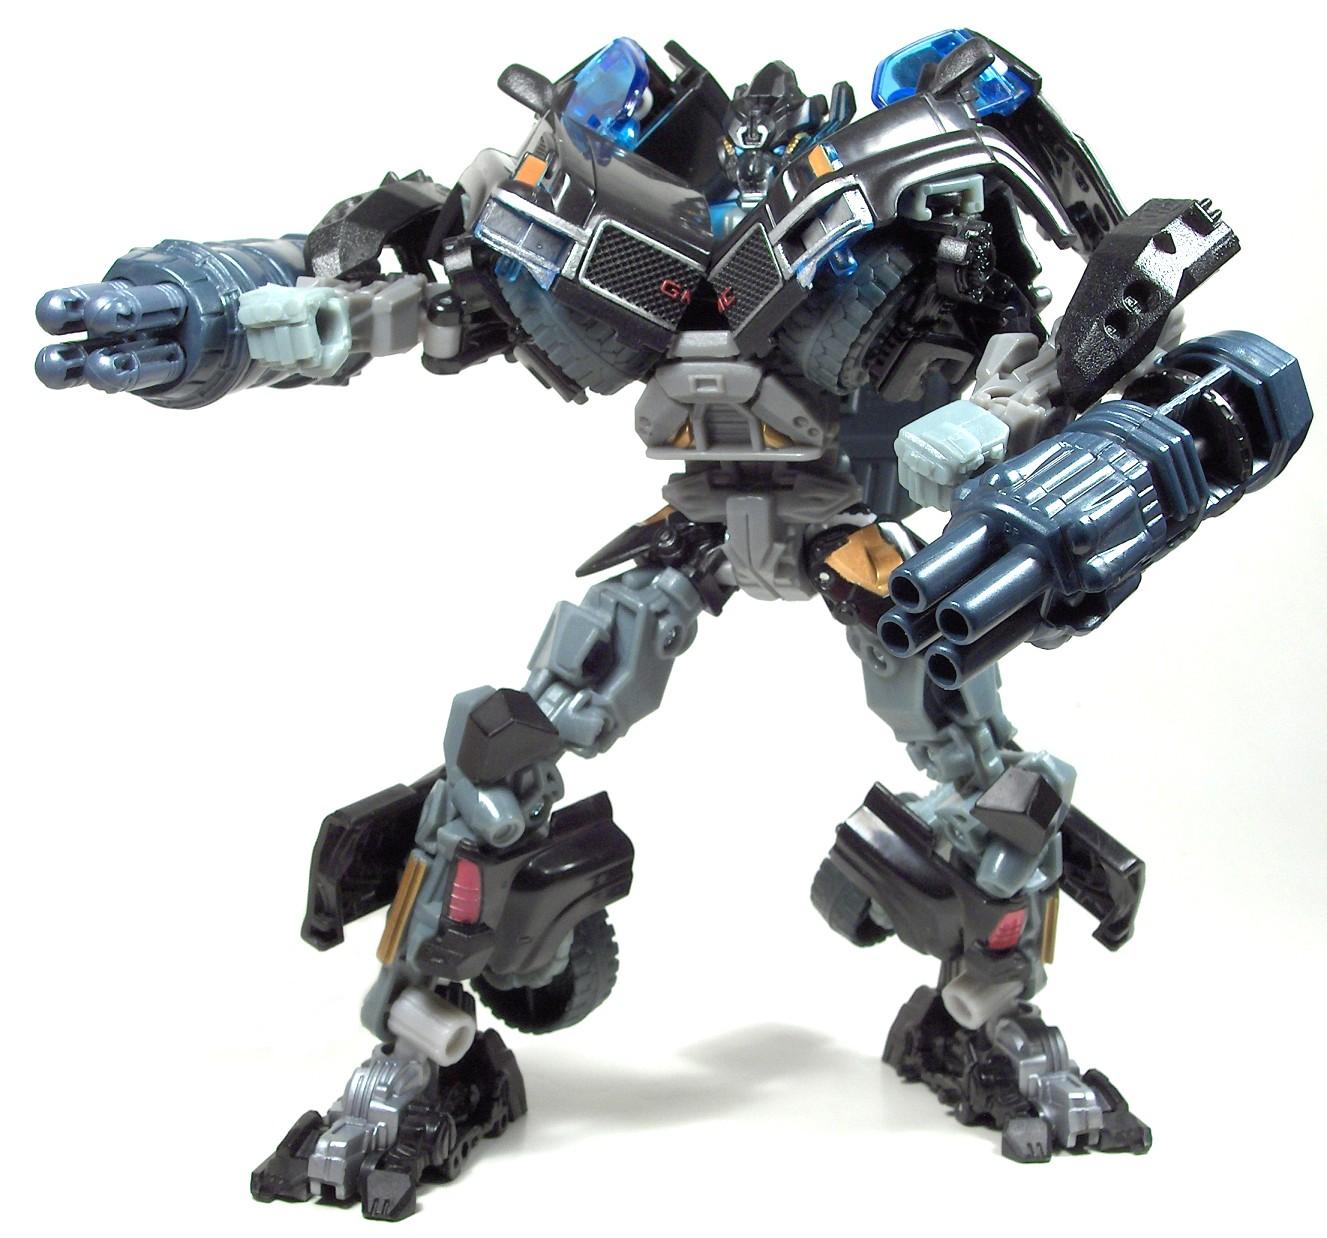 Amazon.com: Transformers Dark of the Moon DA04 Ironhide: Toys & Games